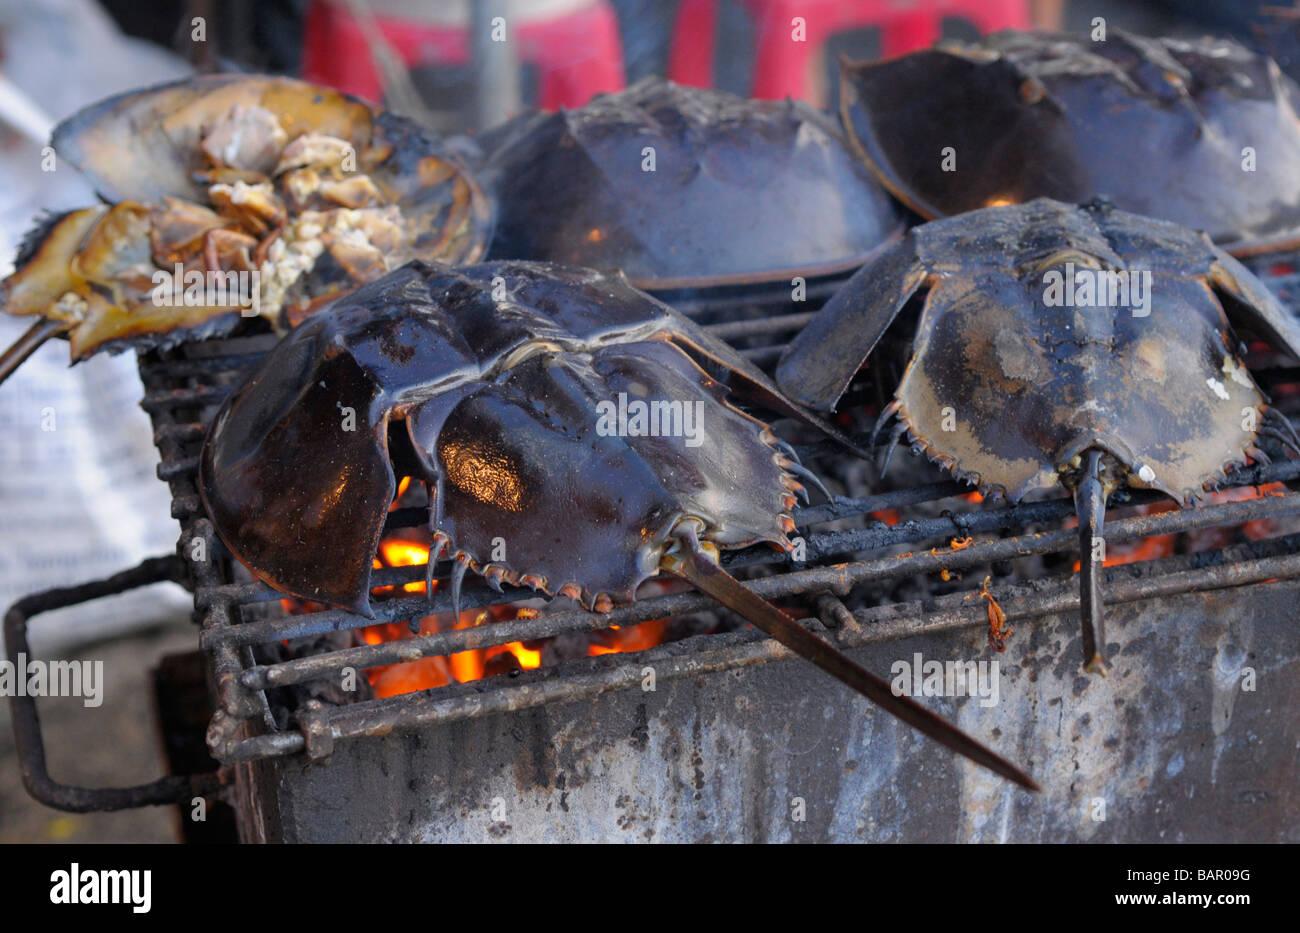 bbq king crab. Stock Photo